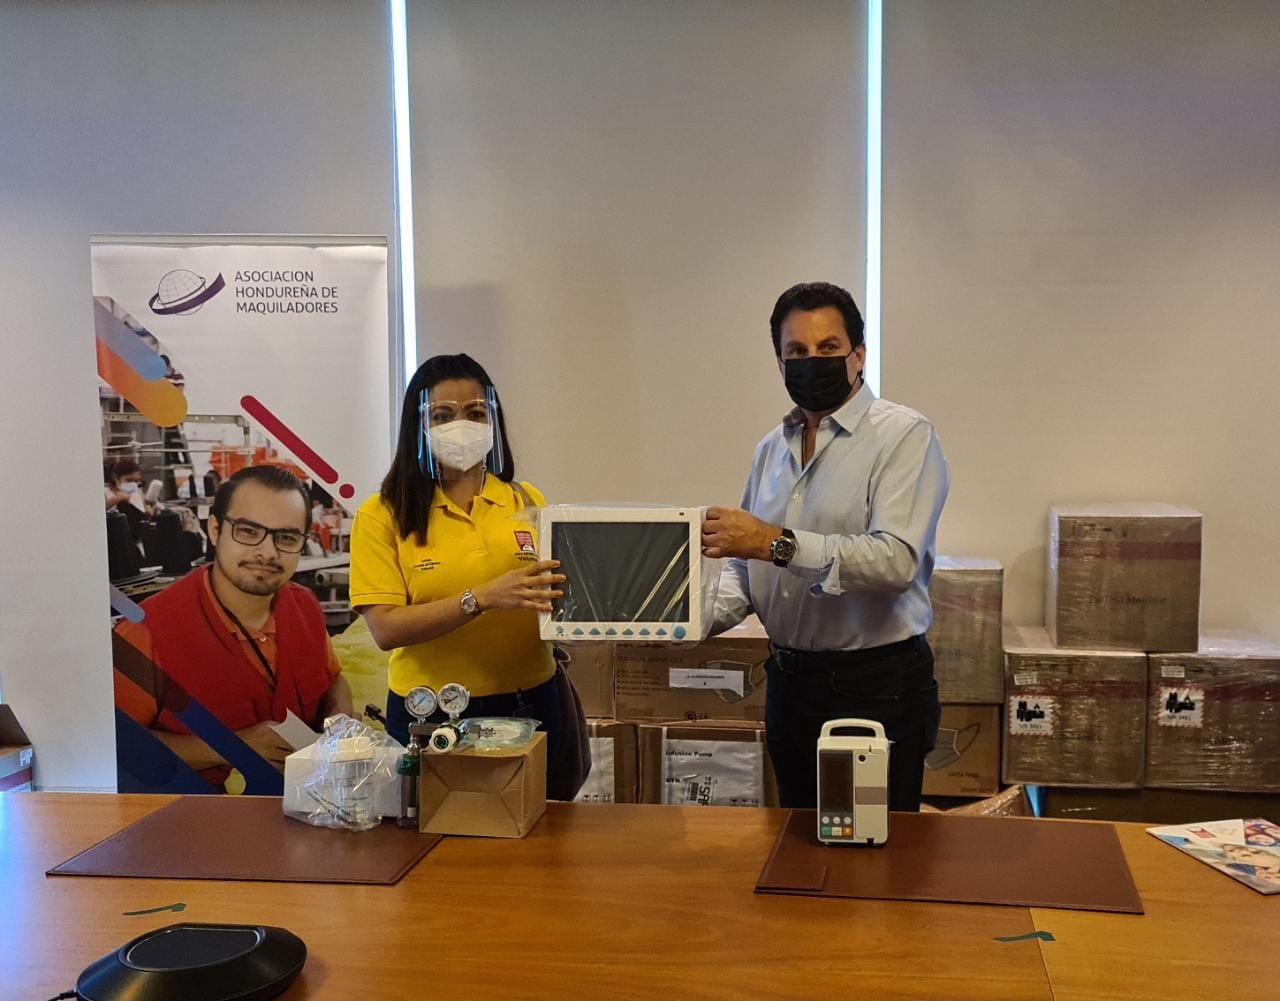 Maquiladores donan más de un millón de lempiras en equipo médico a Fundación del Niño con Cáncer.